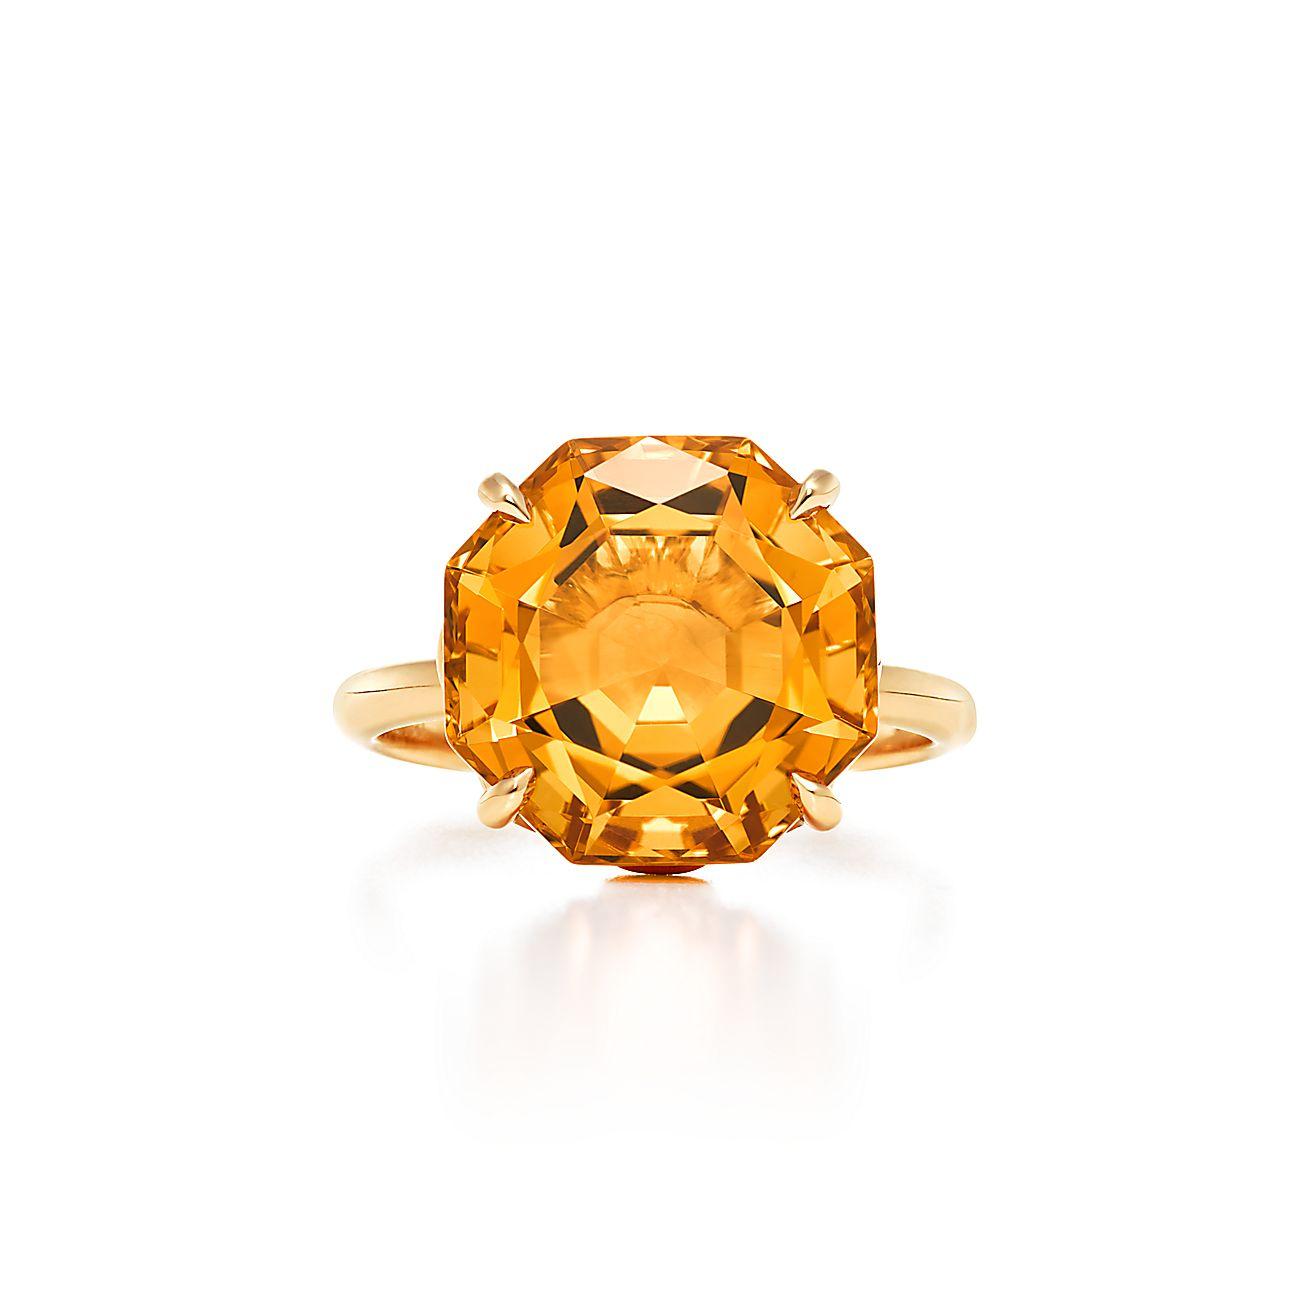 Tiffany Sparklers:Octagonal Citrine Ring